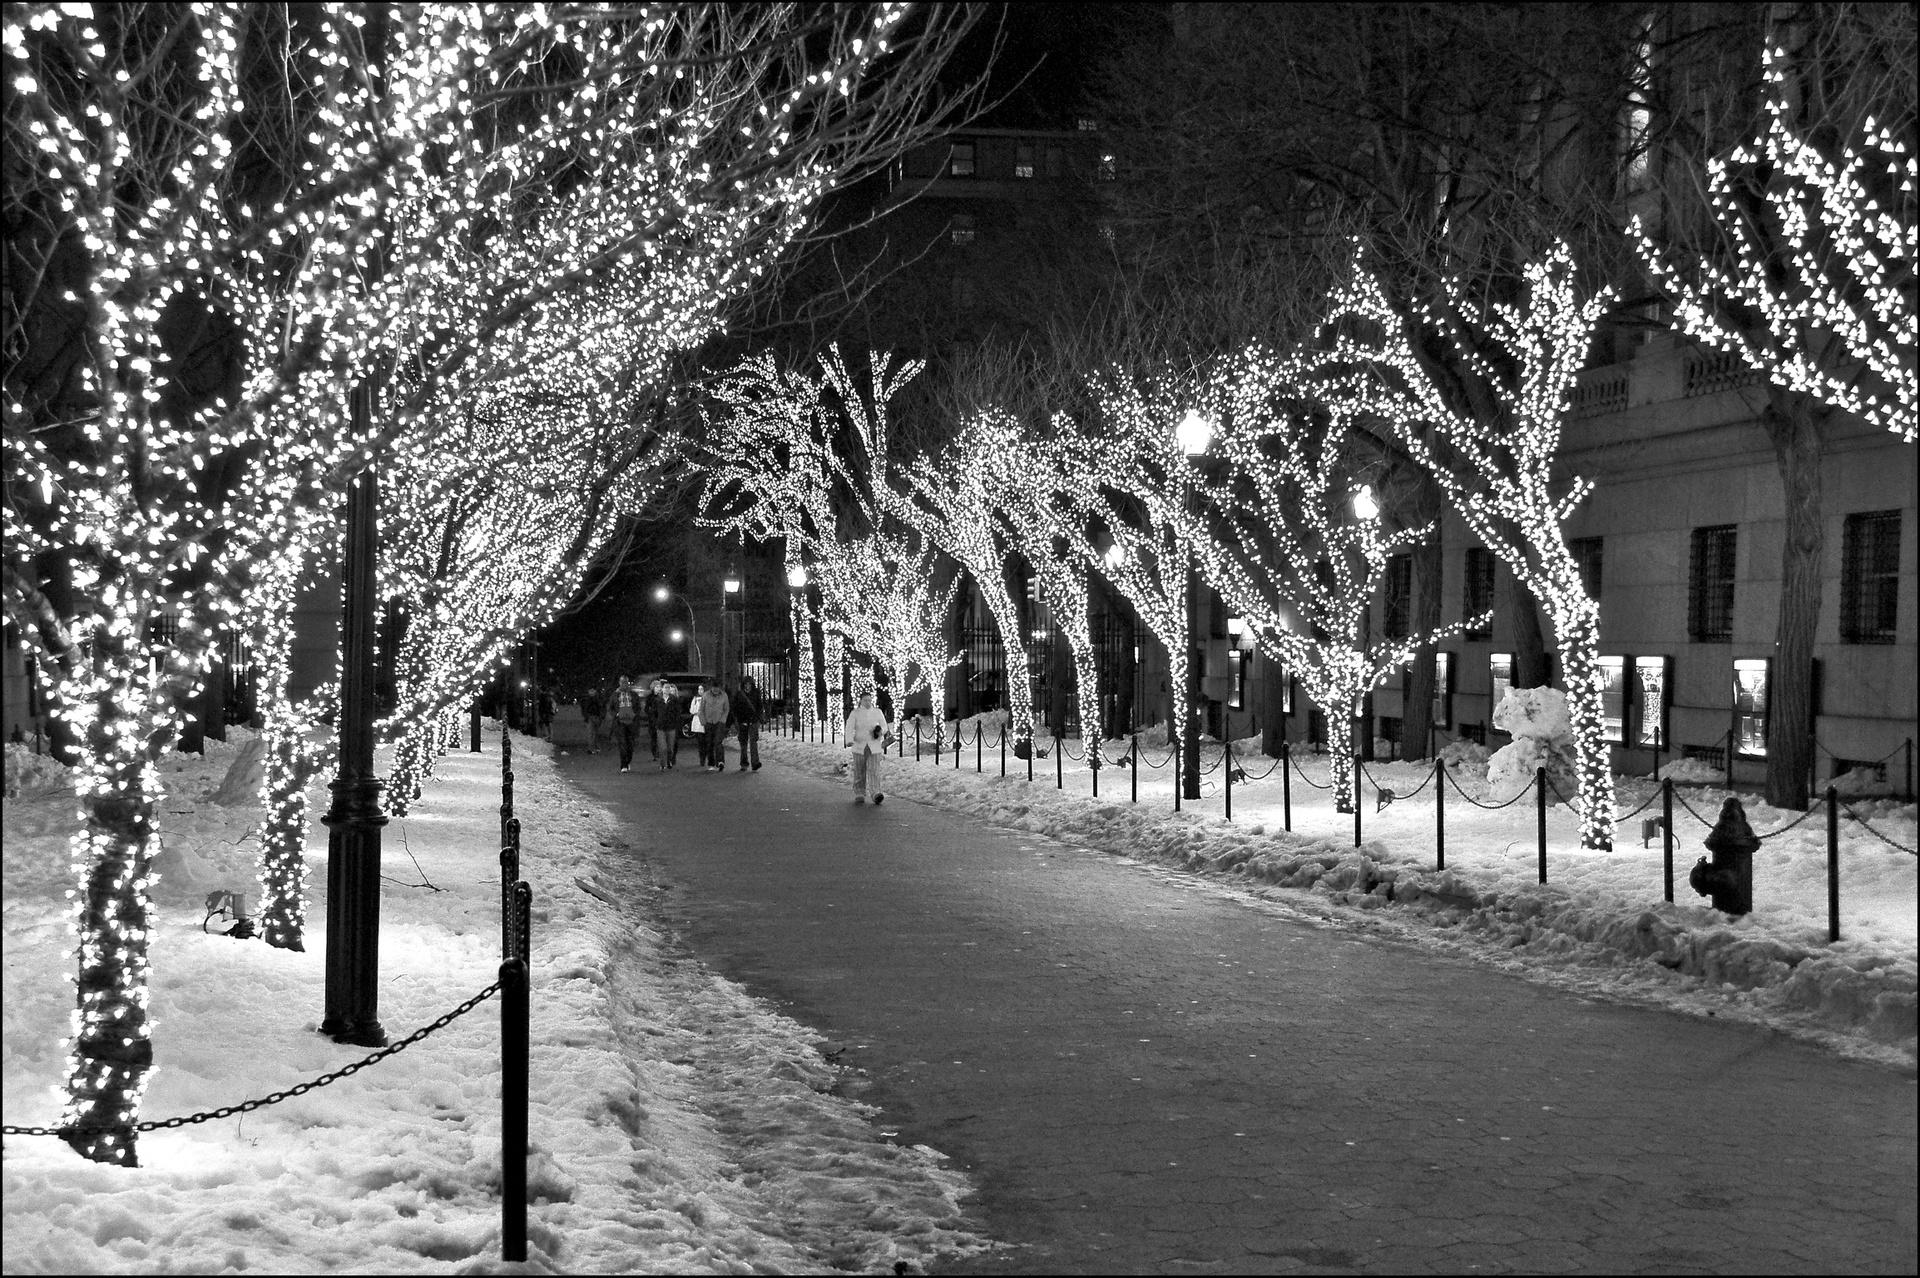 Columbia University Lights. The illuminated entrance to Columbia University at night in black and white. Campus X-mas lights Columbia University.